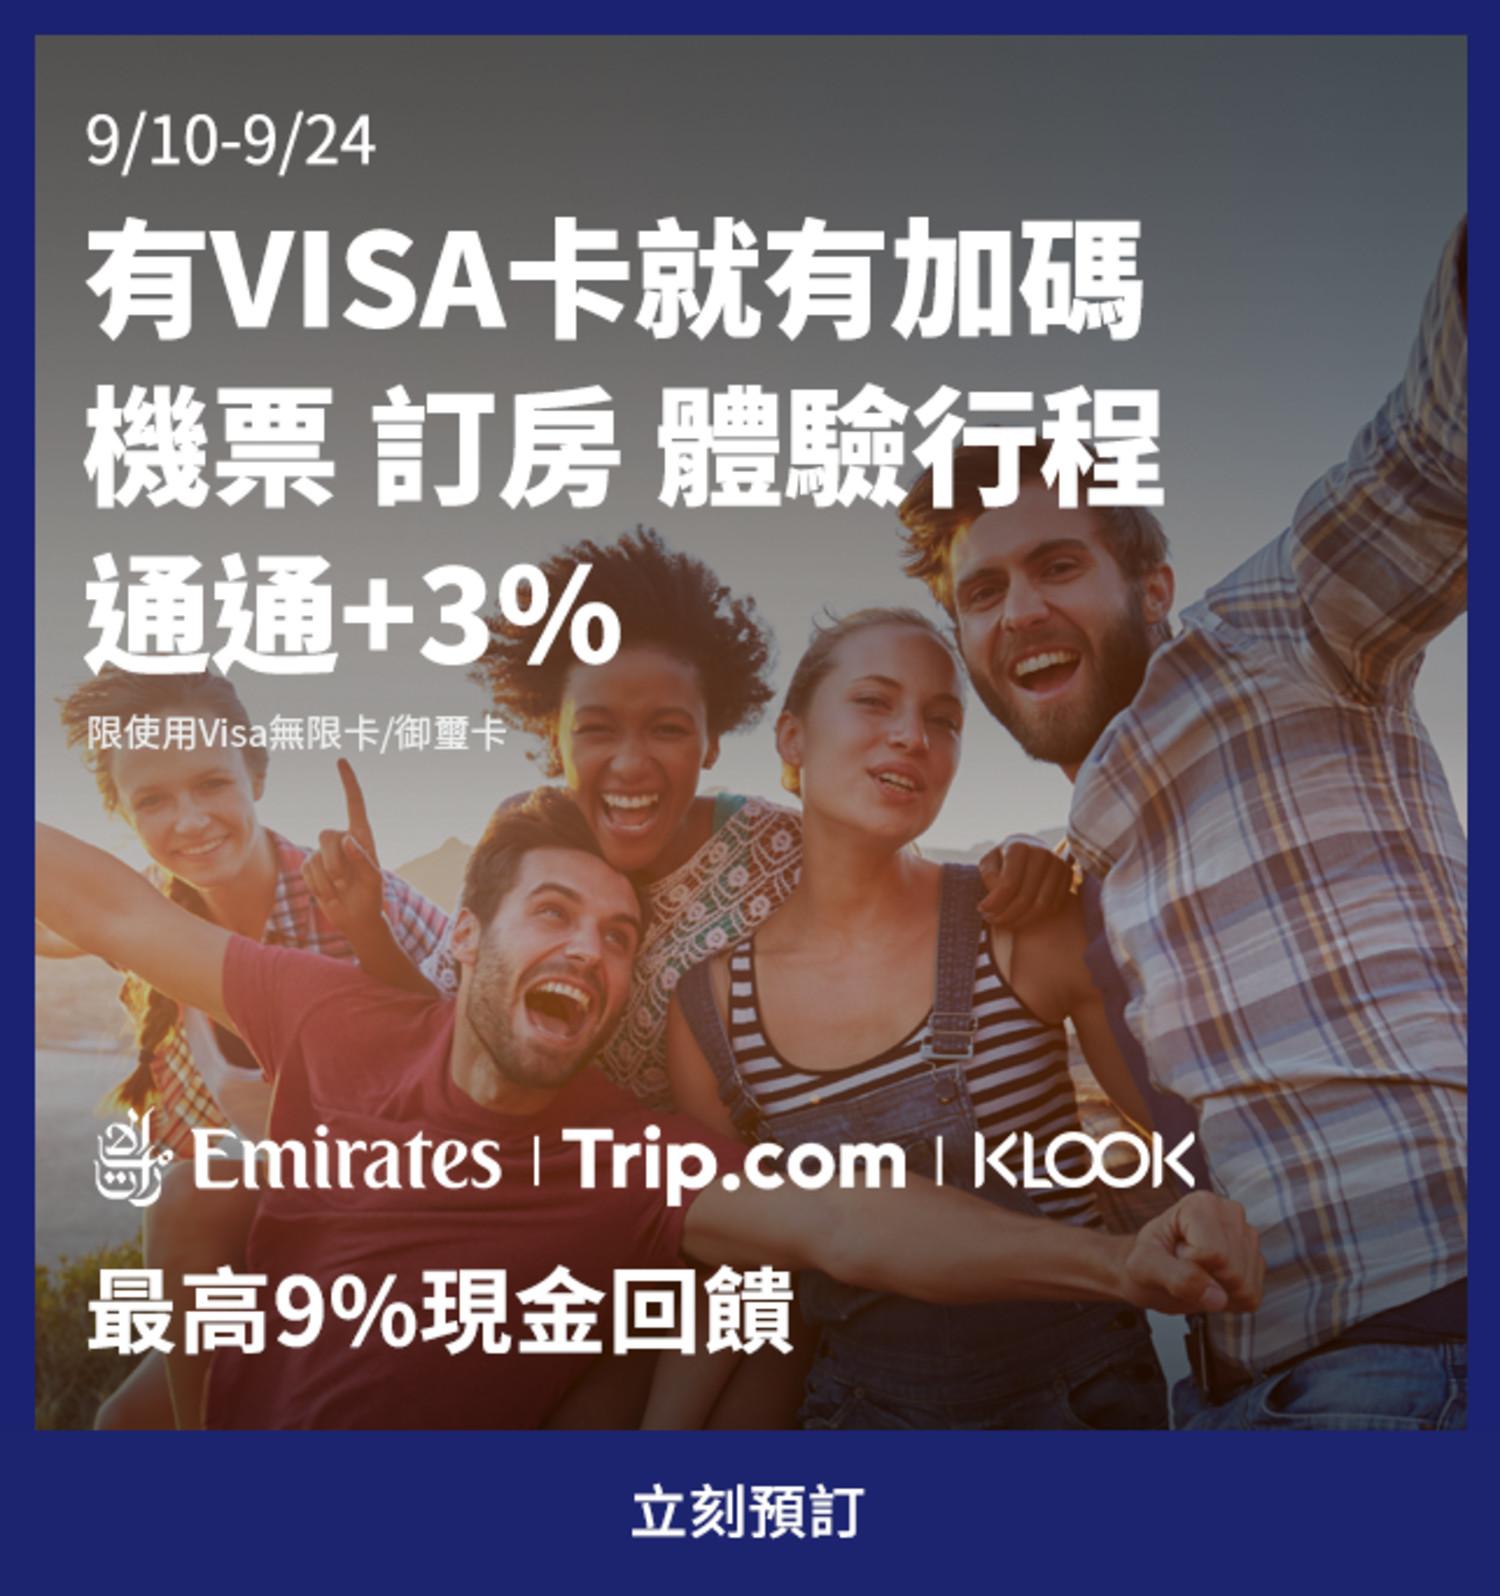 Visa 旅遊週 9/10-9/24